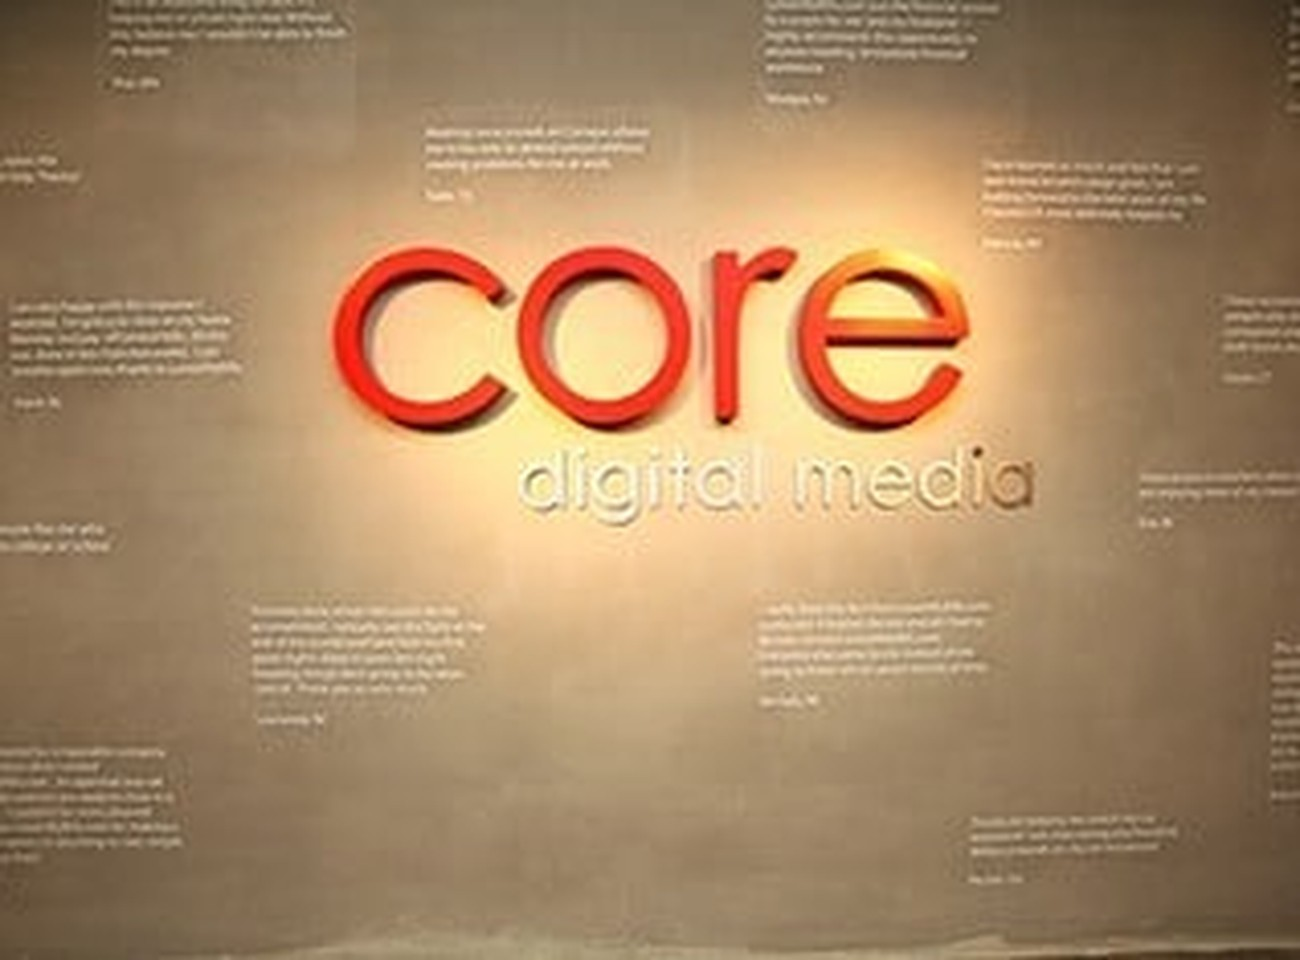 Core Digital Media Careers